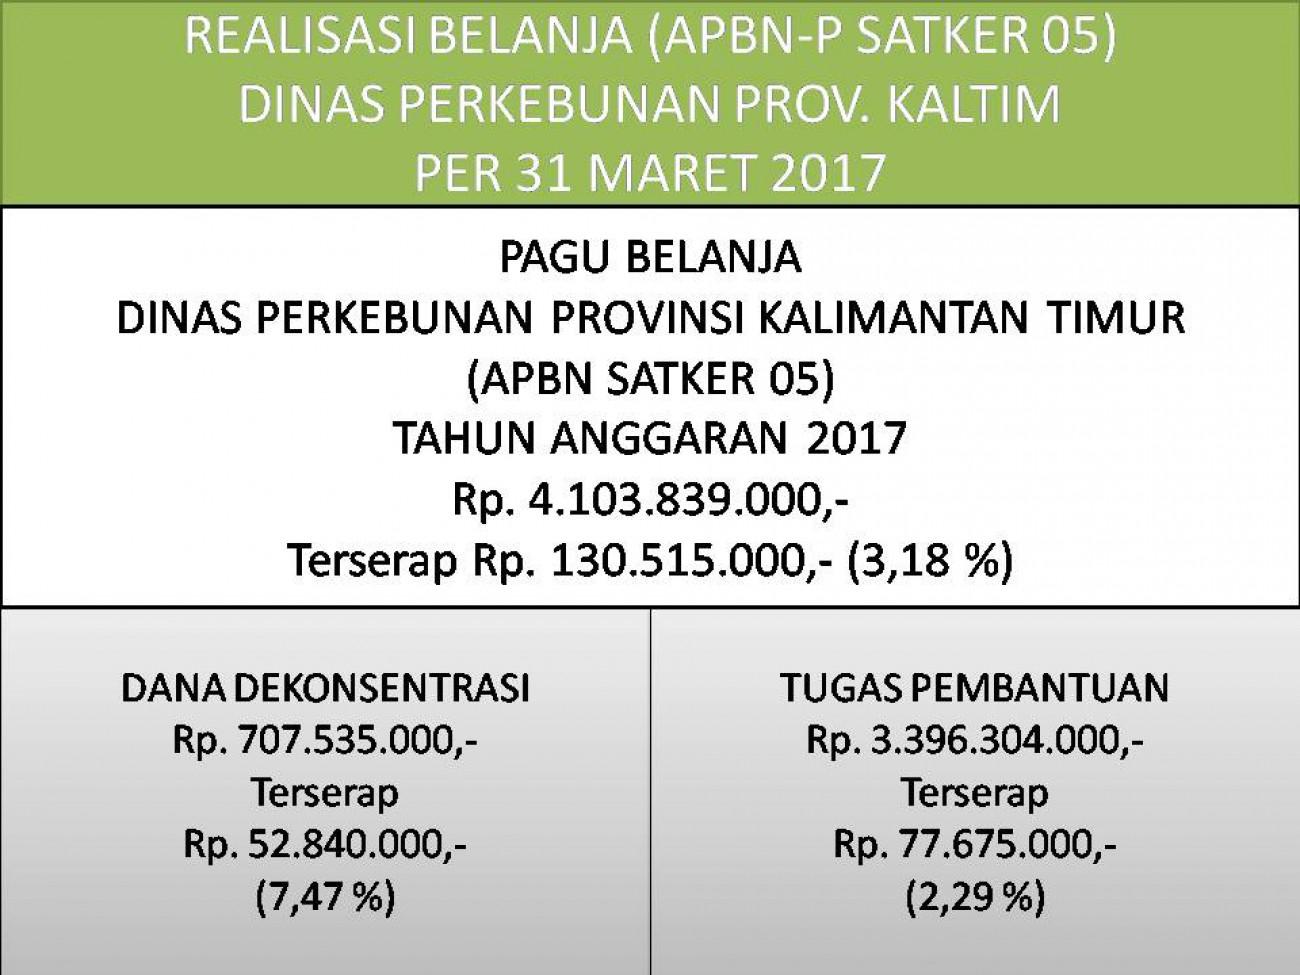 Laporan Realisasi APBN Satker 05 (Direktorat Jenderal Perkebunan) Dinas Perkebunan Prov. Kaltim Bulan Maret 2017